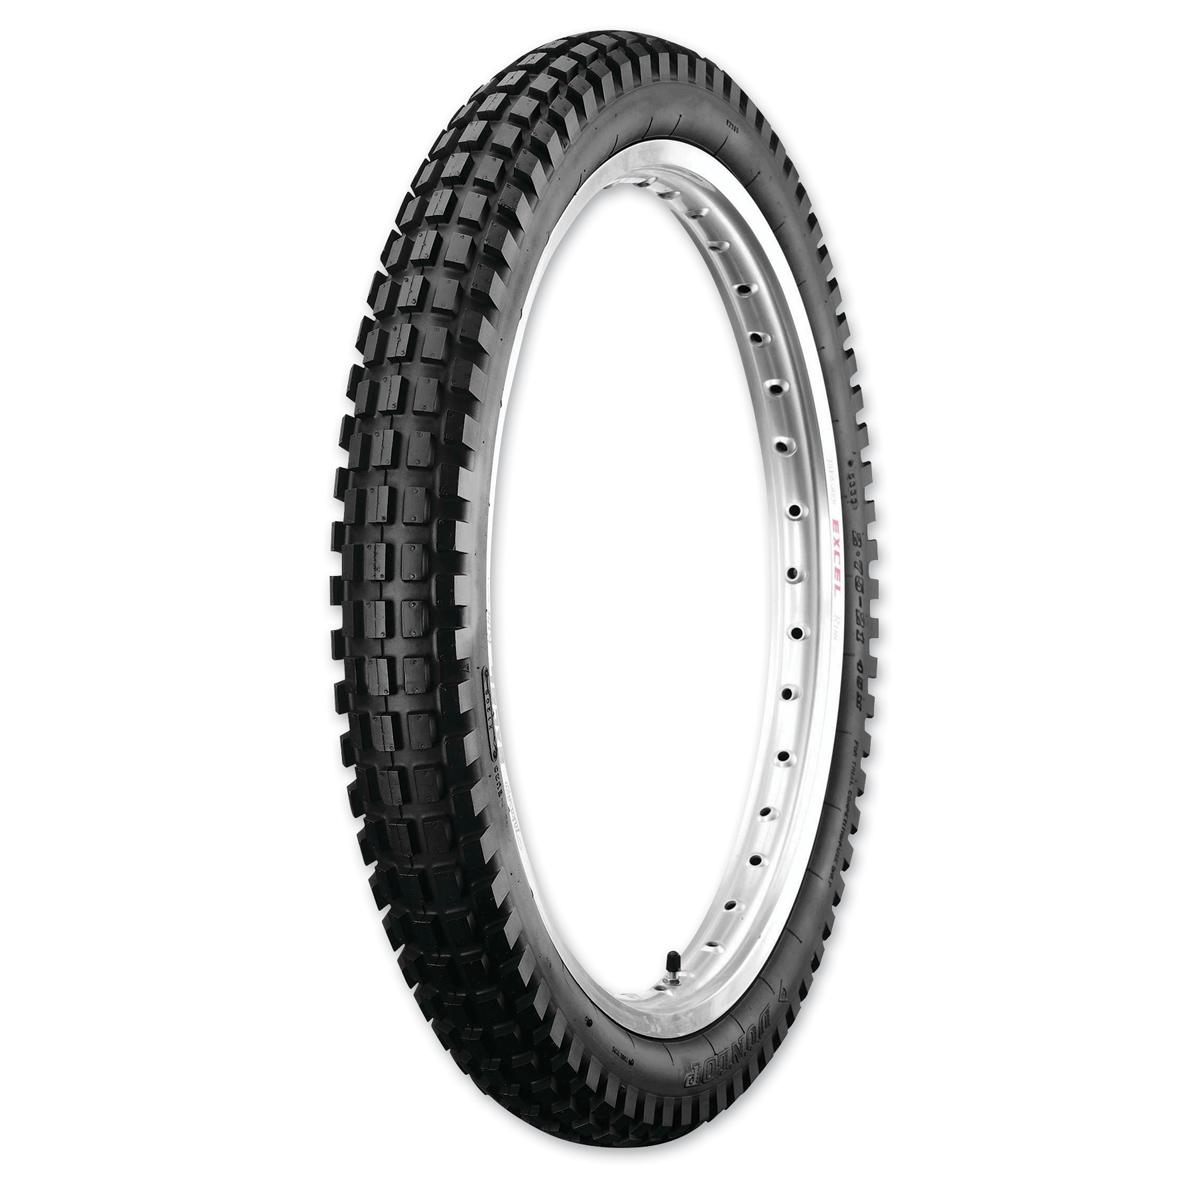 Dunlop D803GP 80/100-21 Trials Front Tire